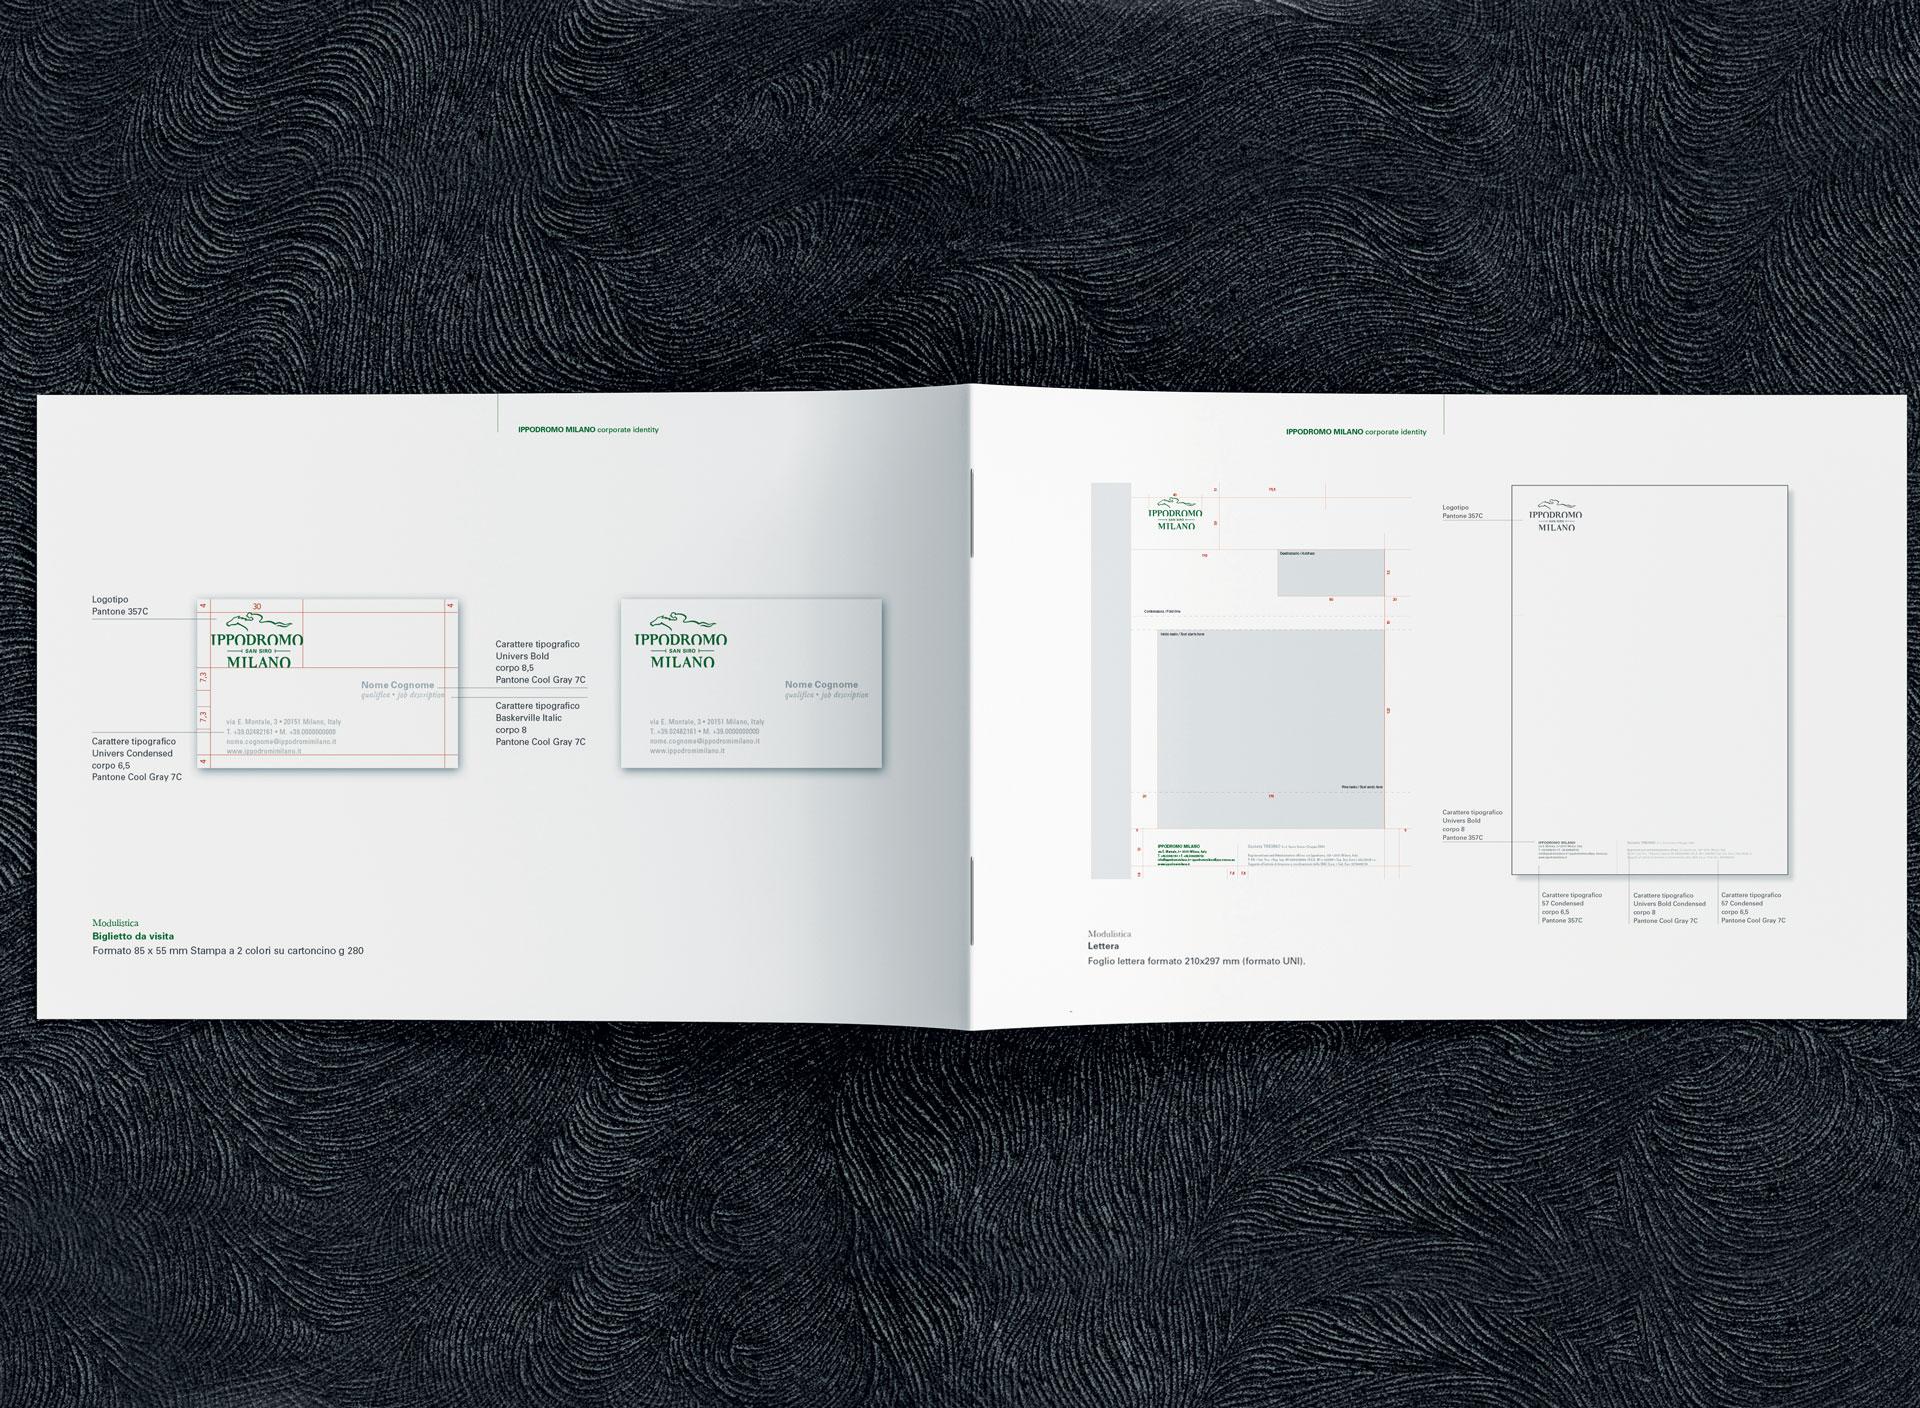 https://www.studiochiesa.it/wp-content/uploads/2020/09/SC_IPMI_sansiro_brandbook_03.jpg